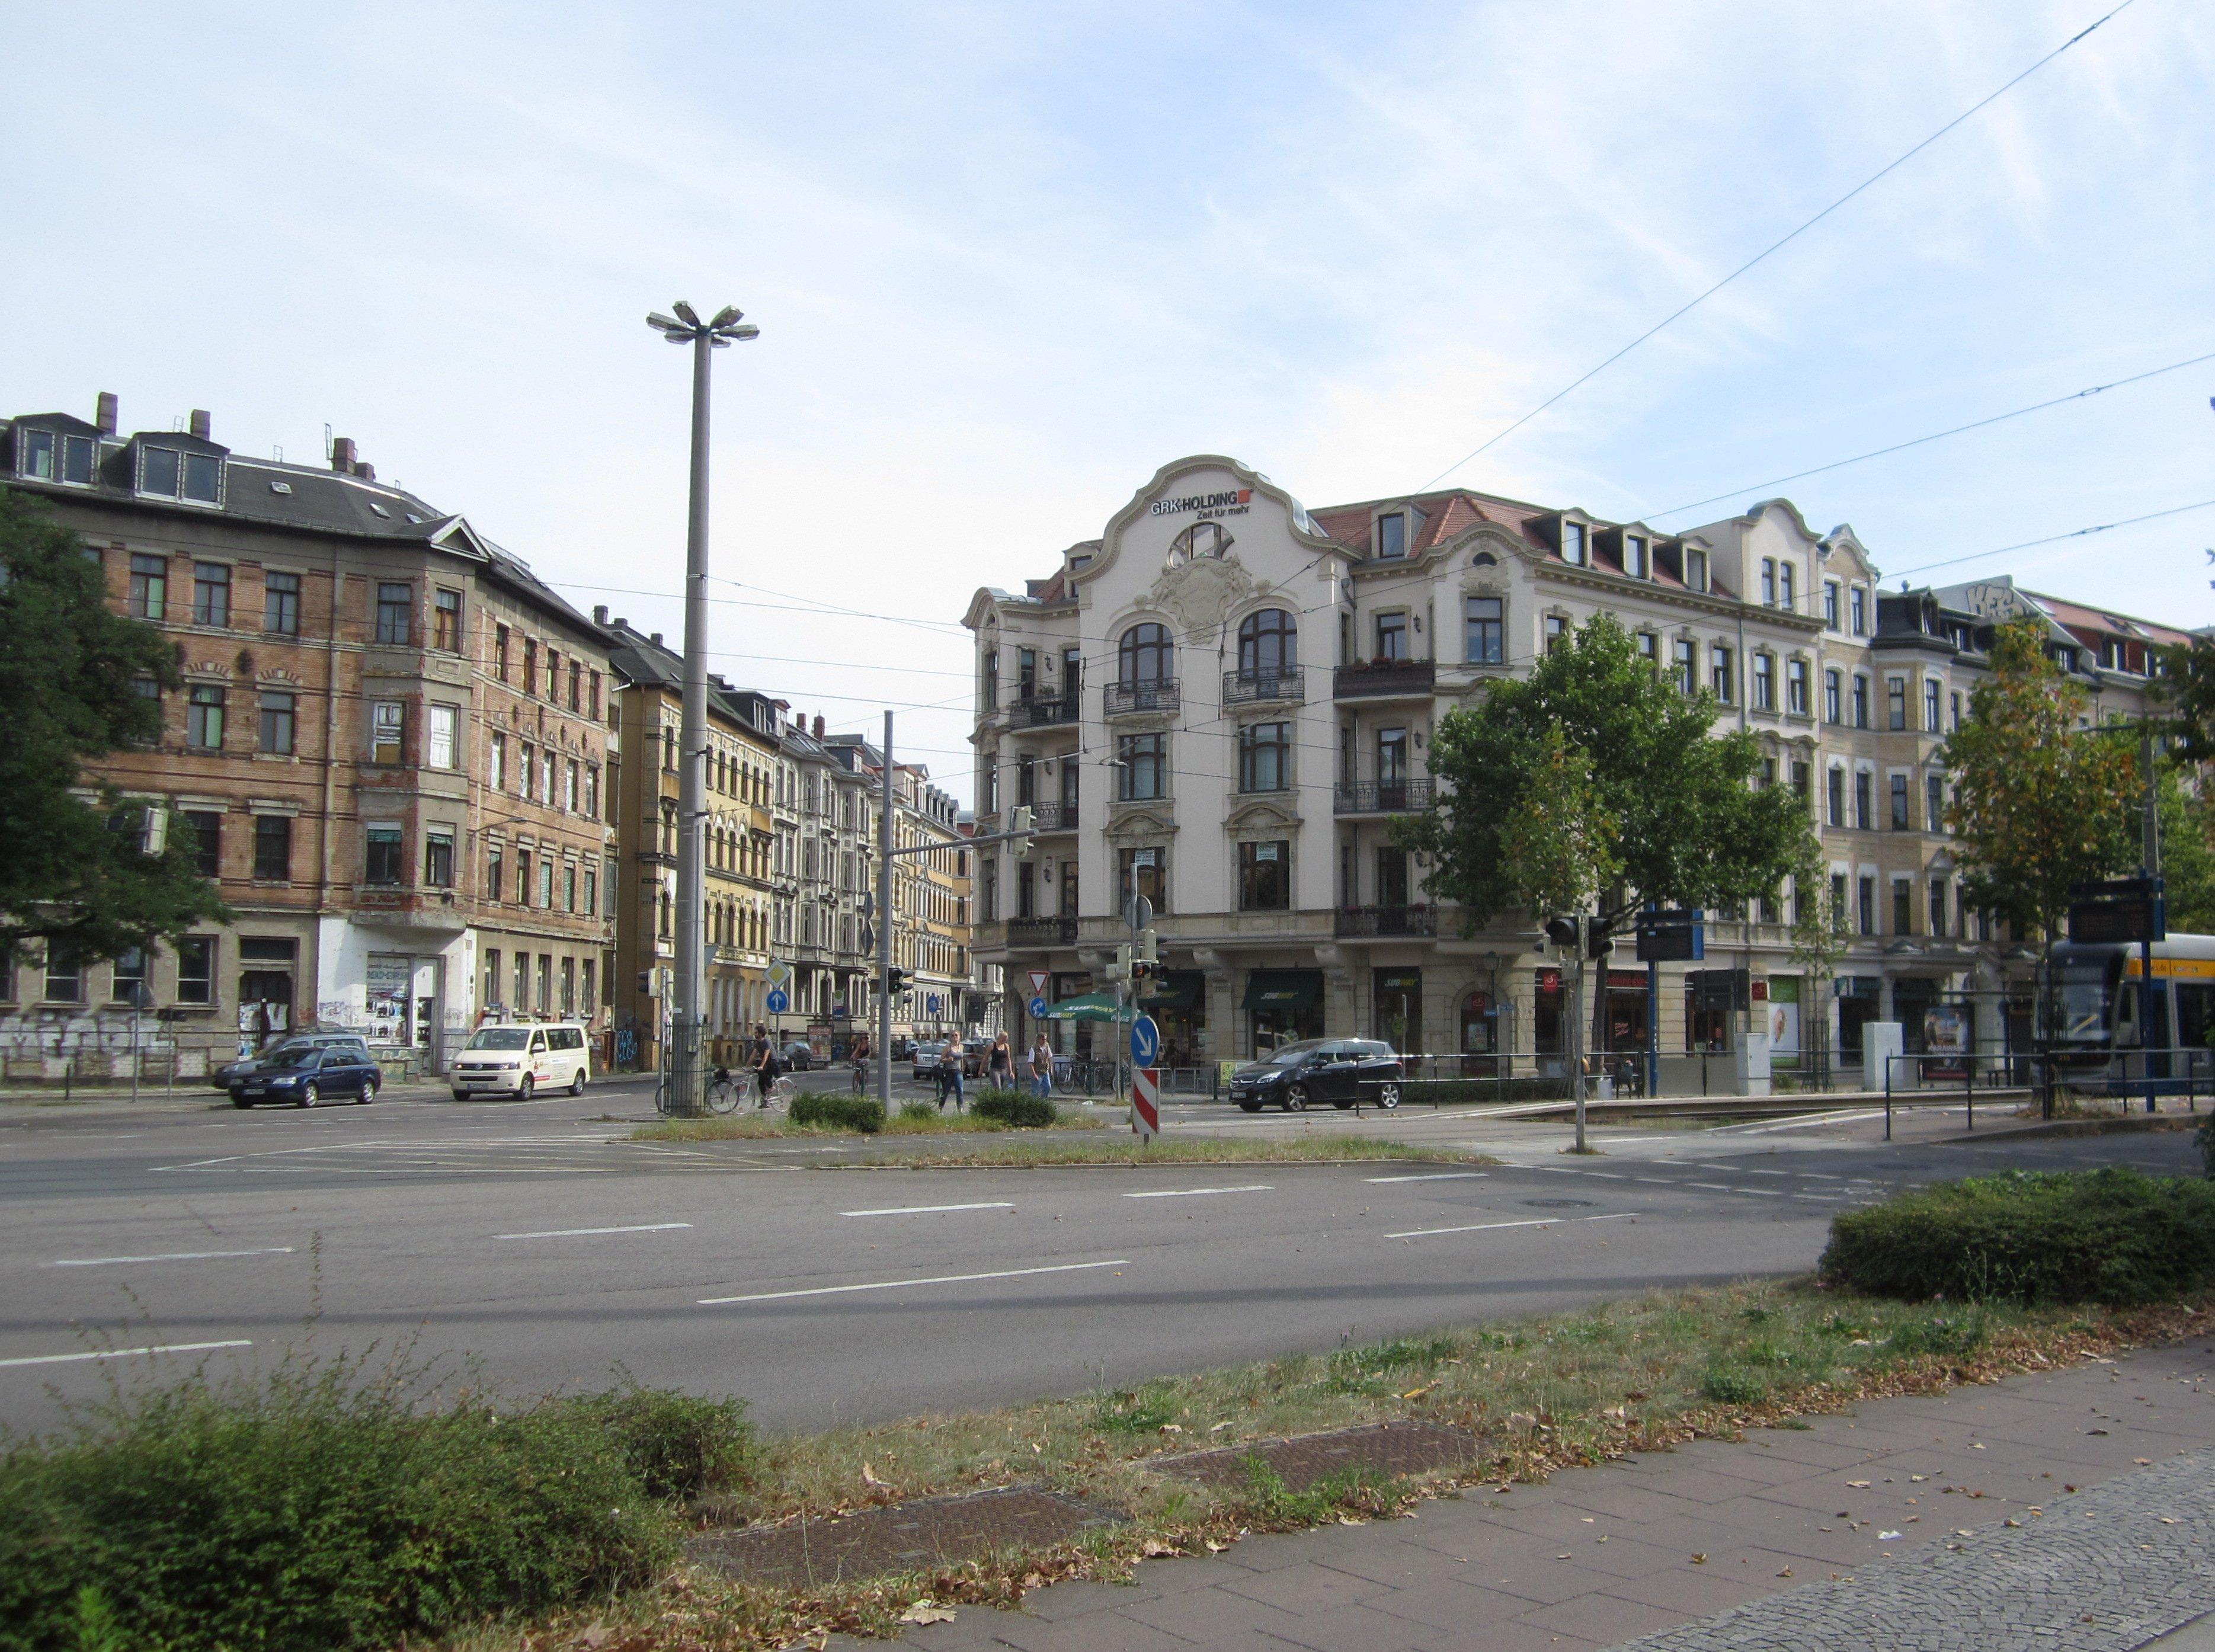 Ostplatz Leipzig file ostplatz leipzig 2016 004 jpg wikimedia commons